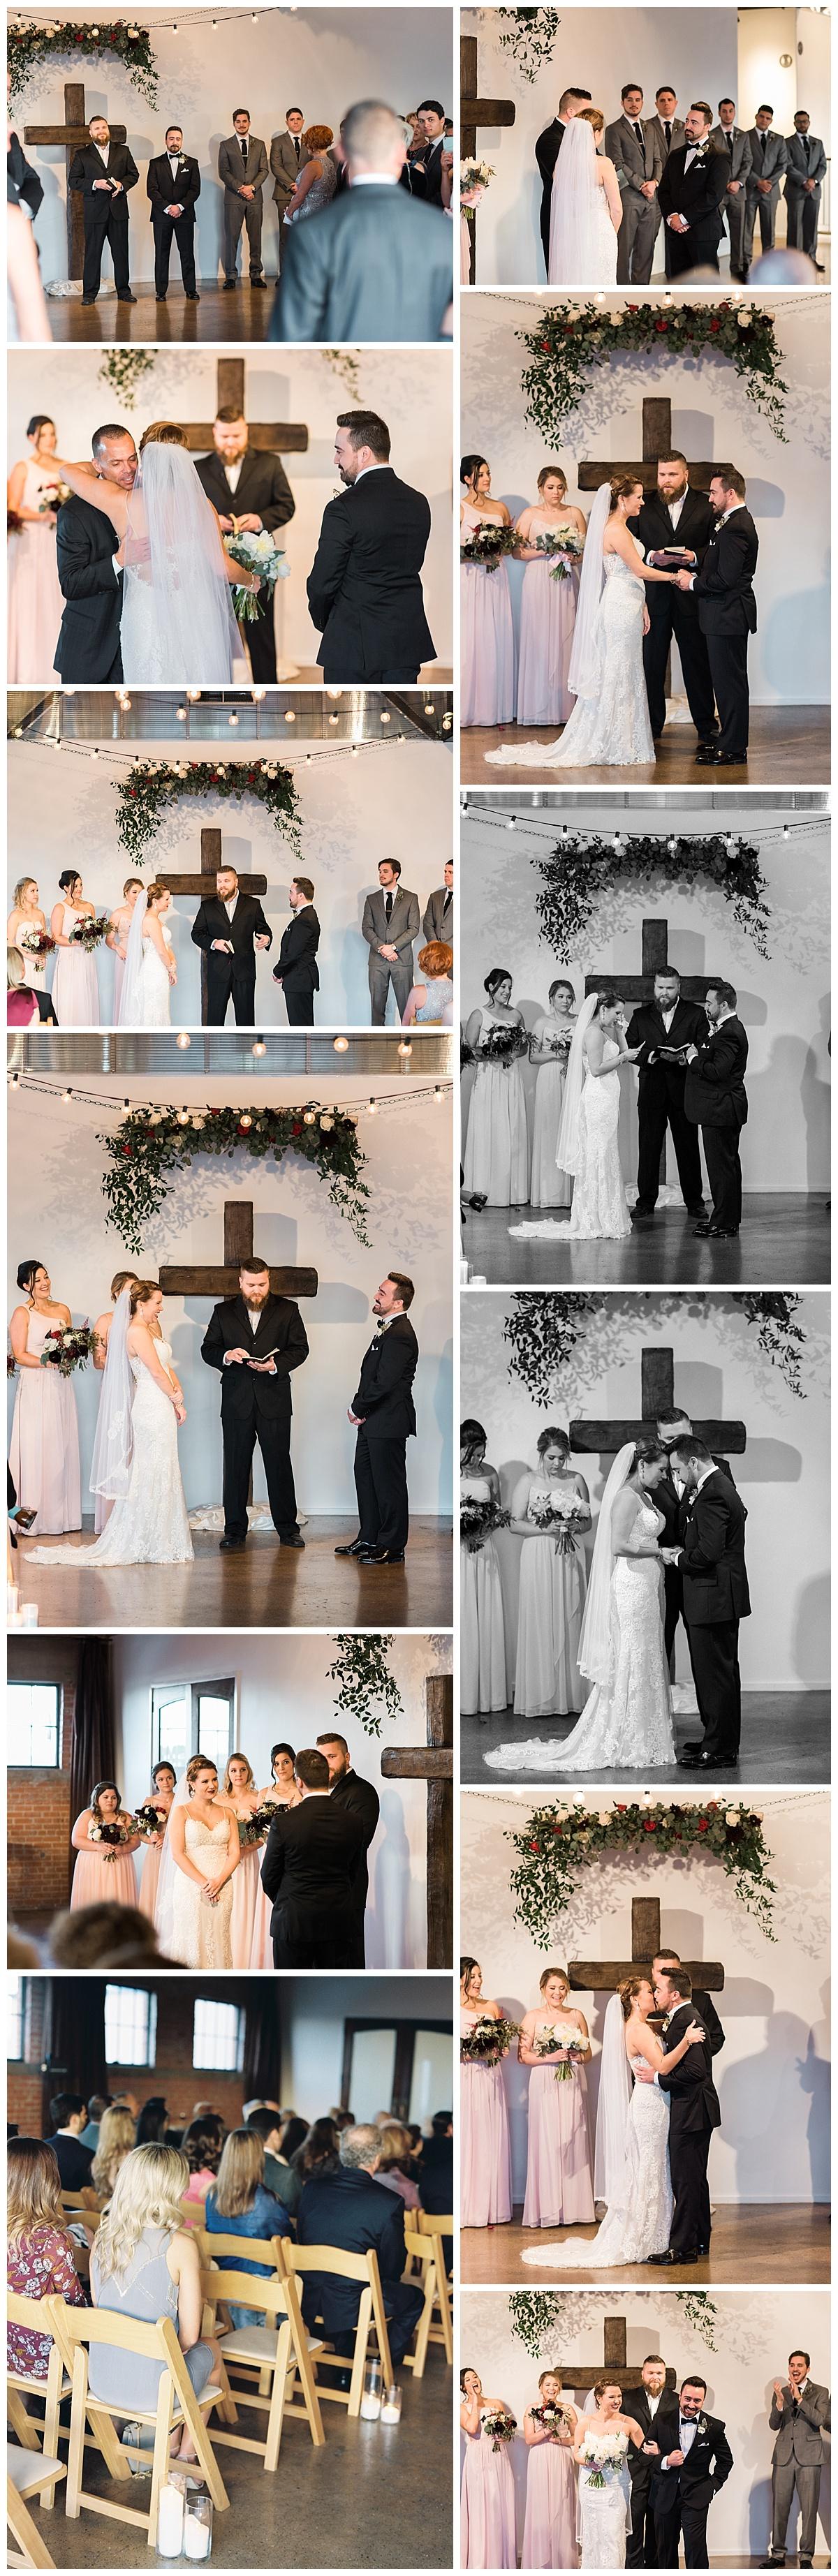 hickory-stree-annex-wedding-ar-photography-nicole-nolan-11.jpg